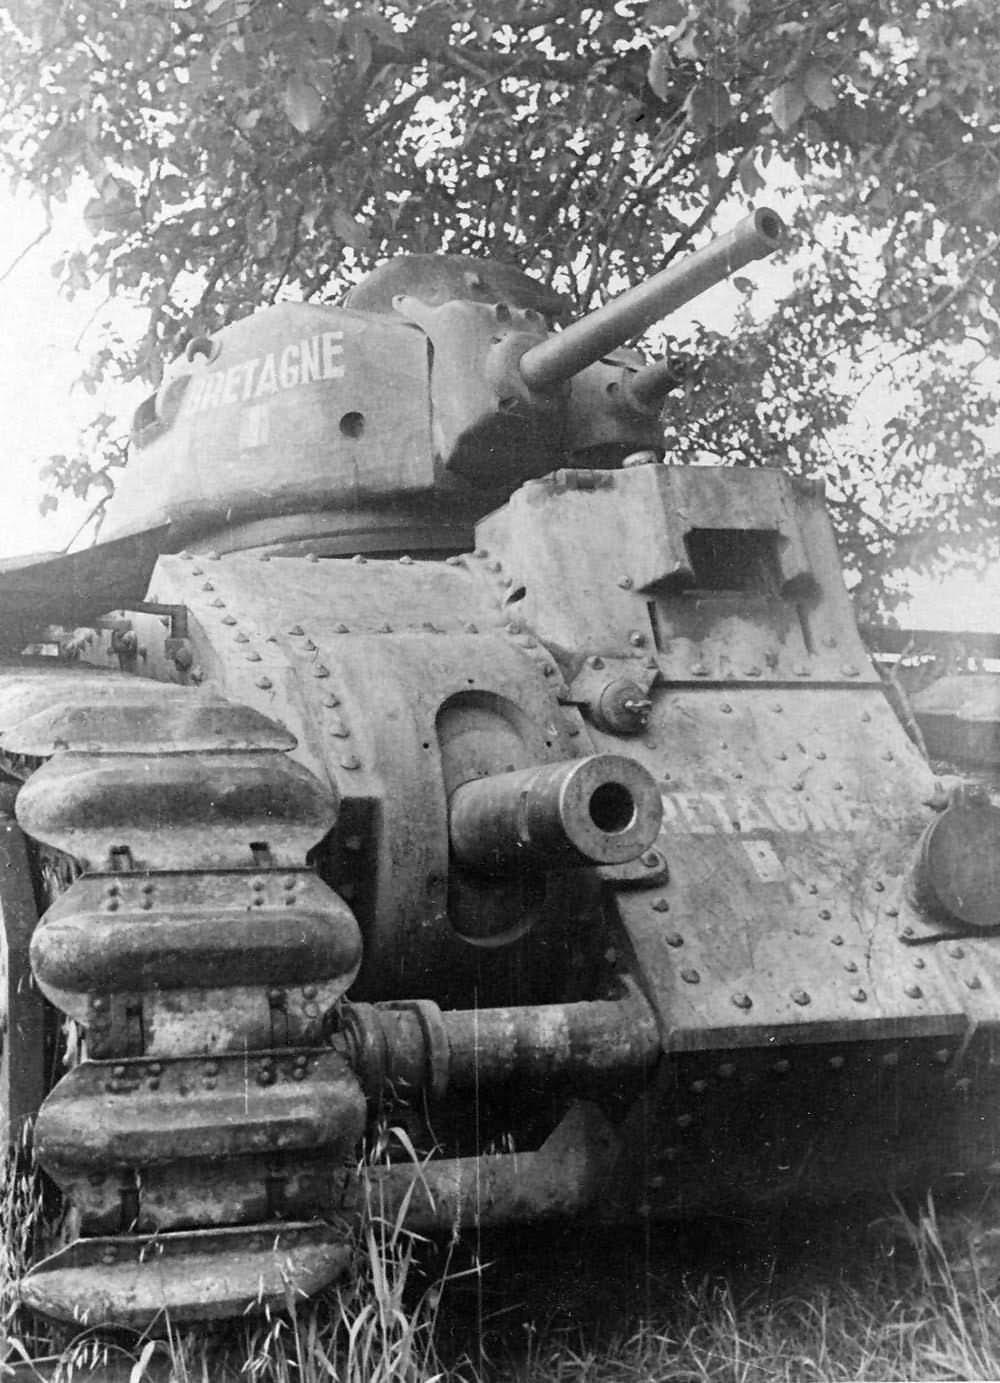 Tank Renault Char B1 number 114 named Bretagne of 511st RCC